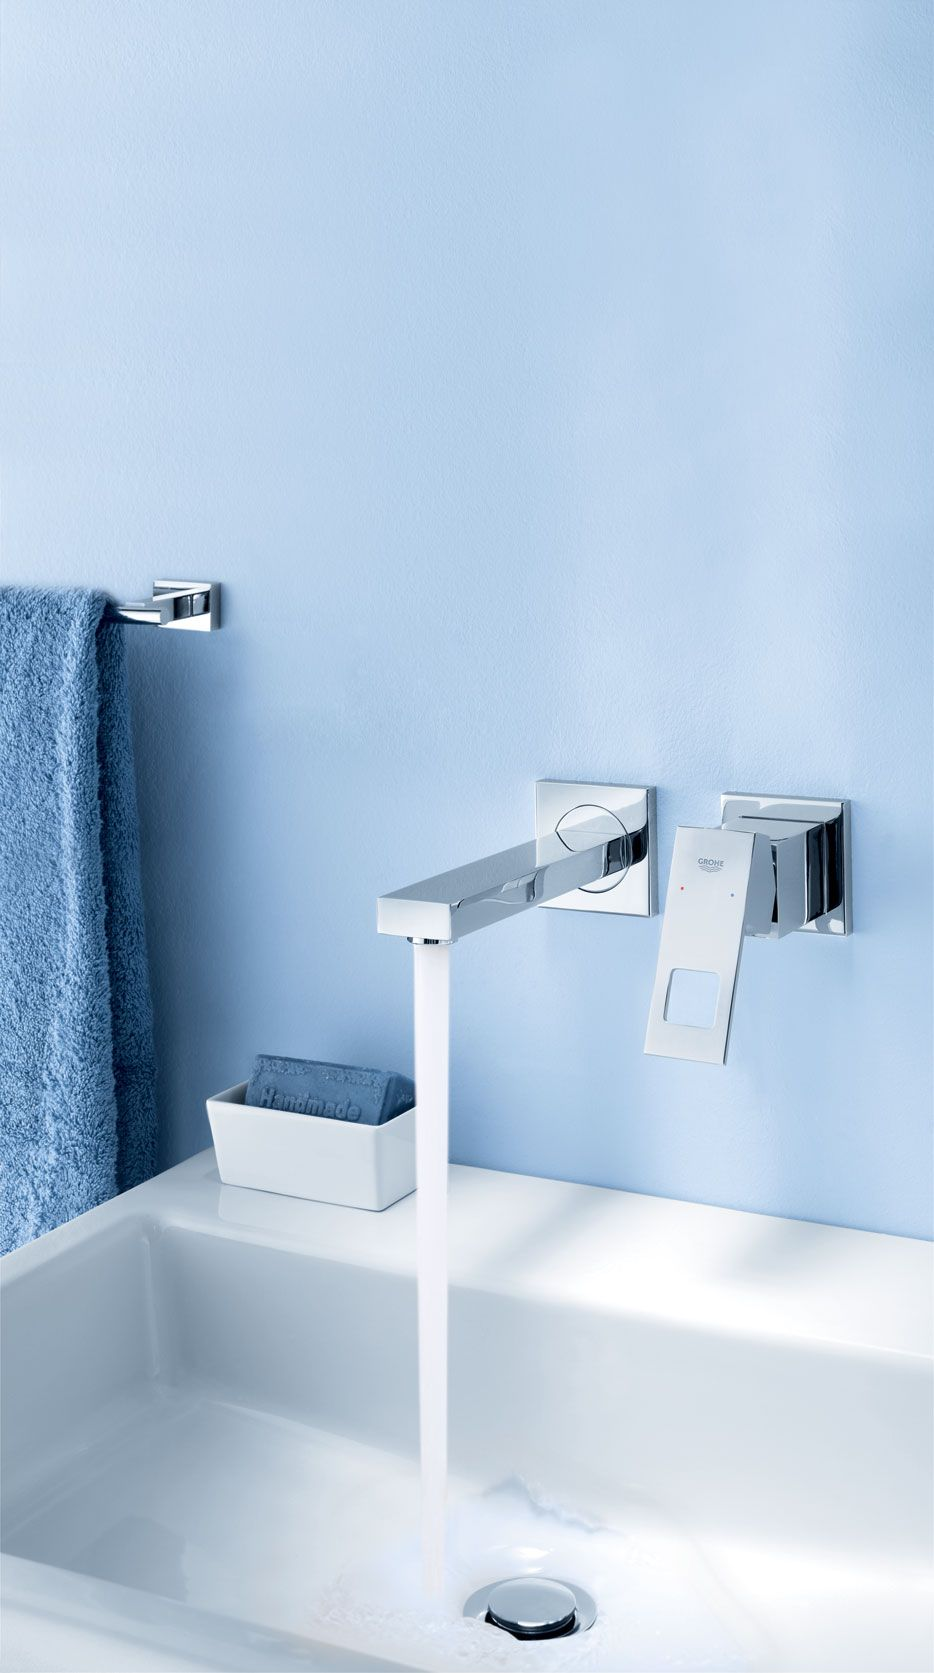 GROHE Eurocube 2hole Wall Mounted Bathroom Faucet